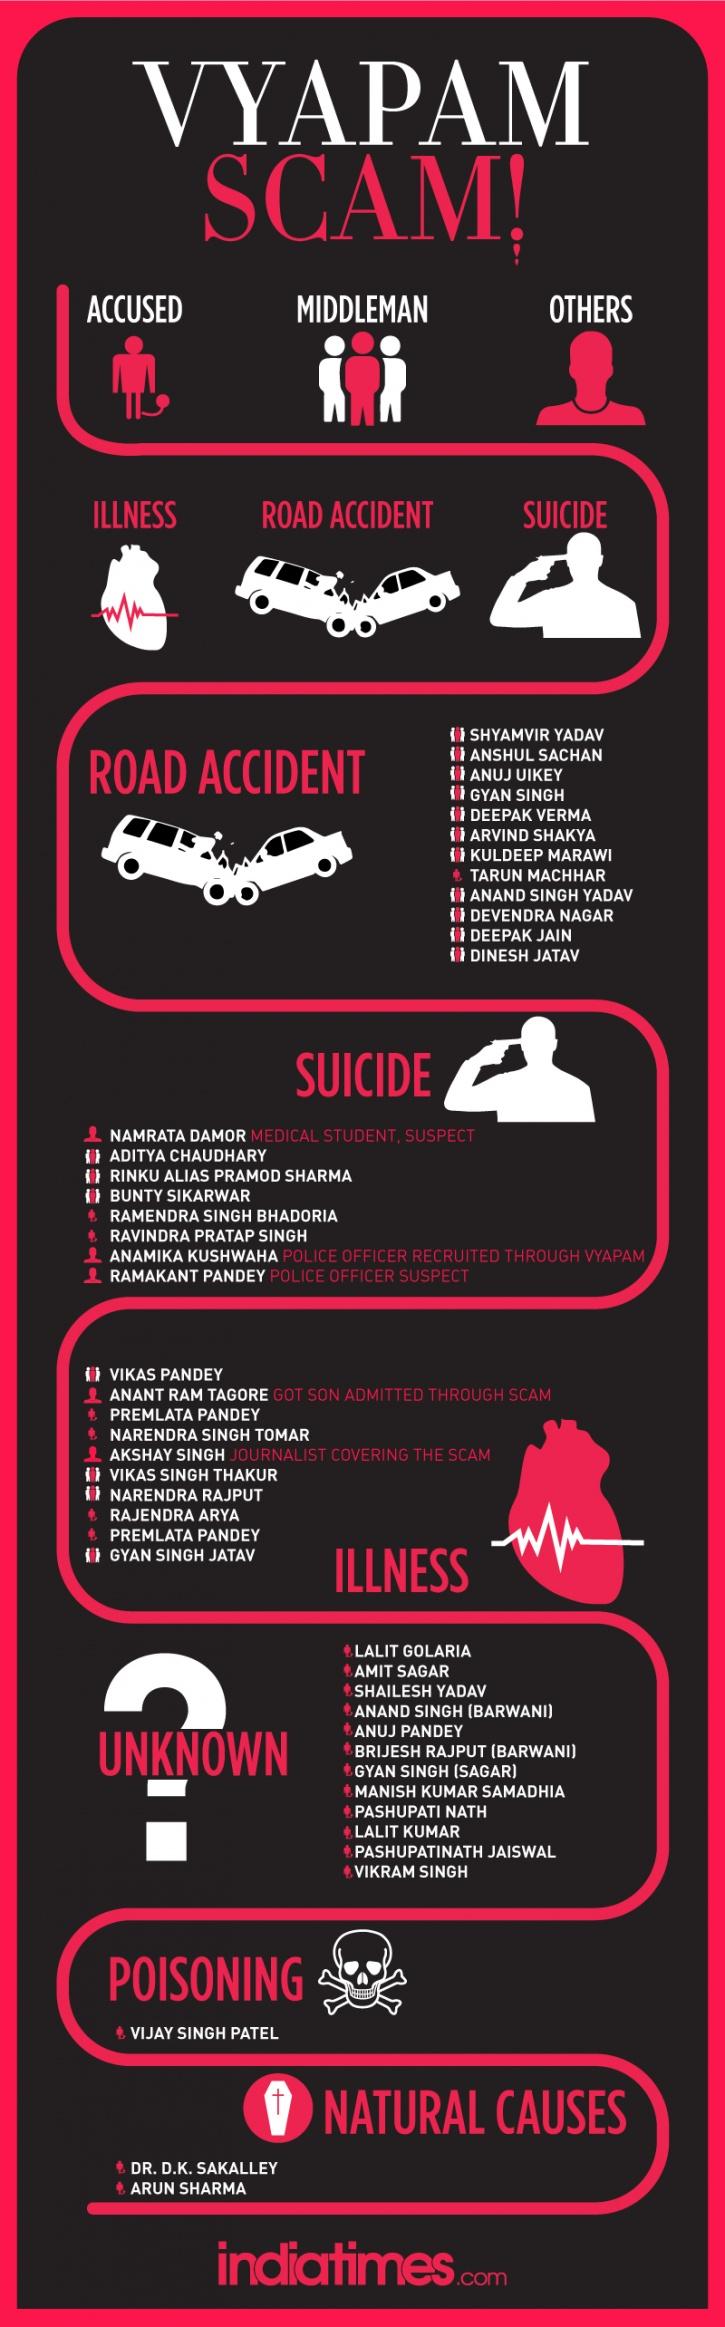 Inforgraphic on vyapam scam deaths